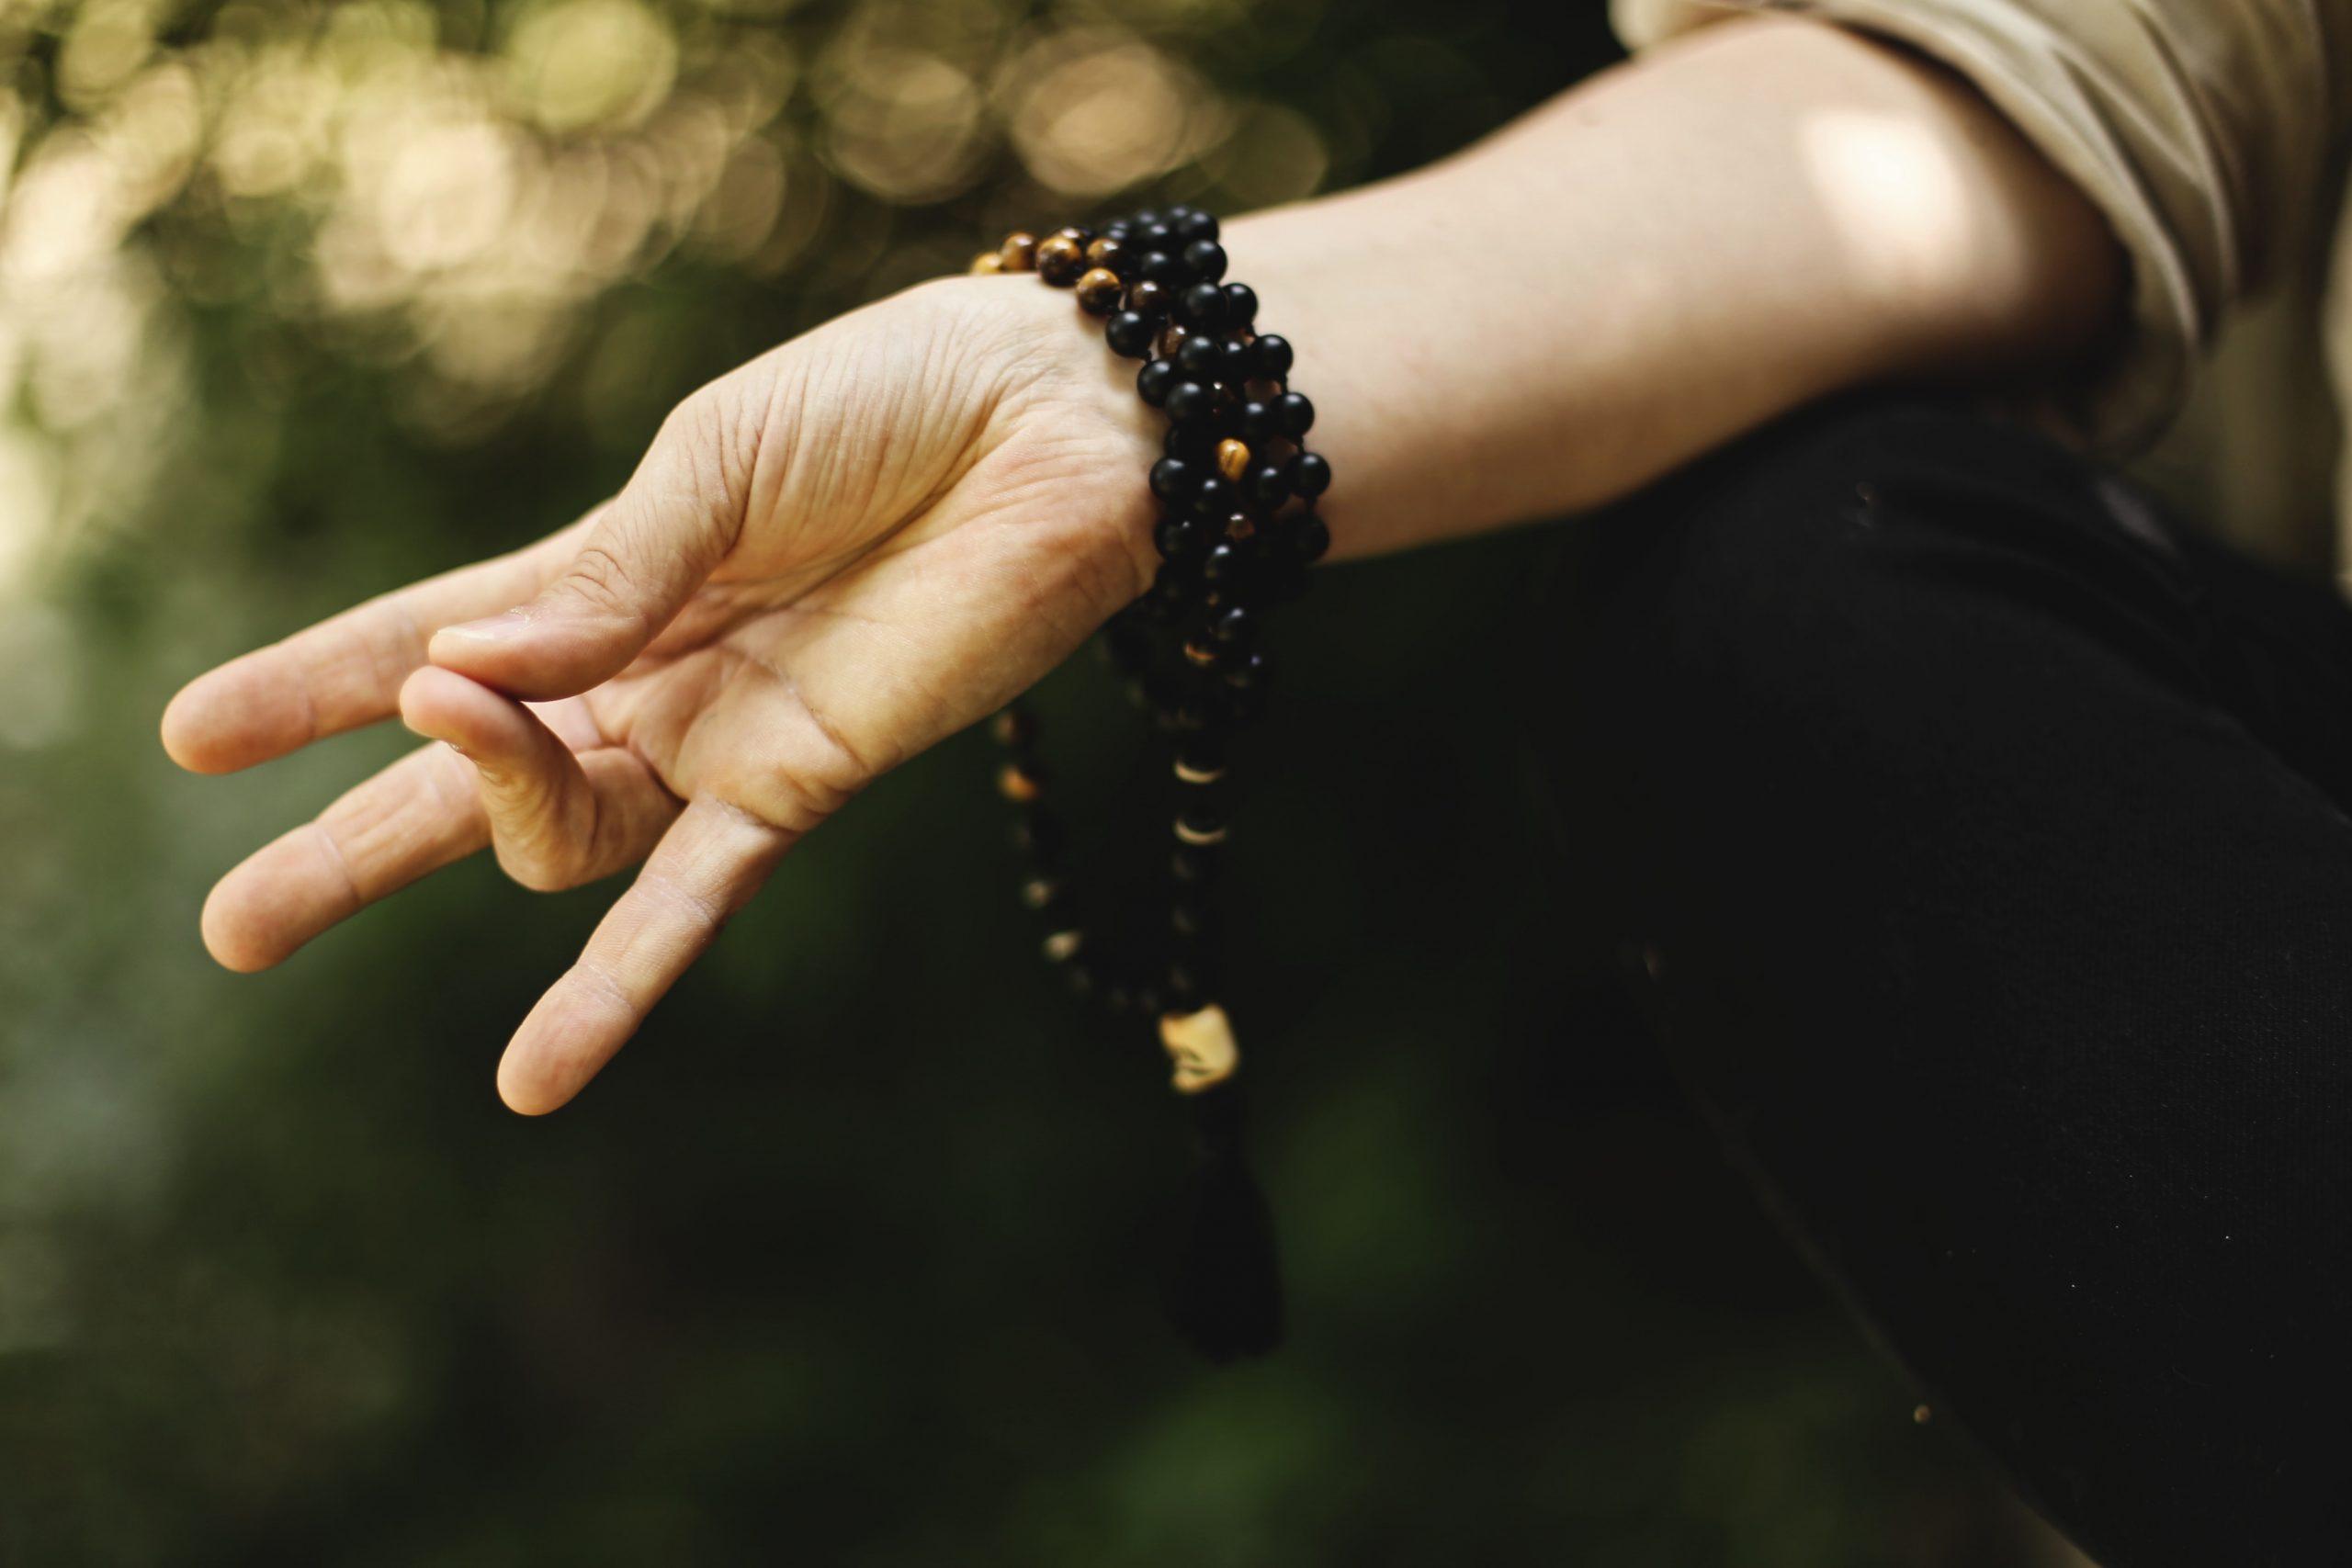 seance mindfulness